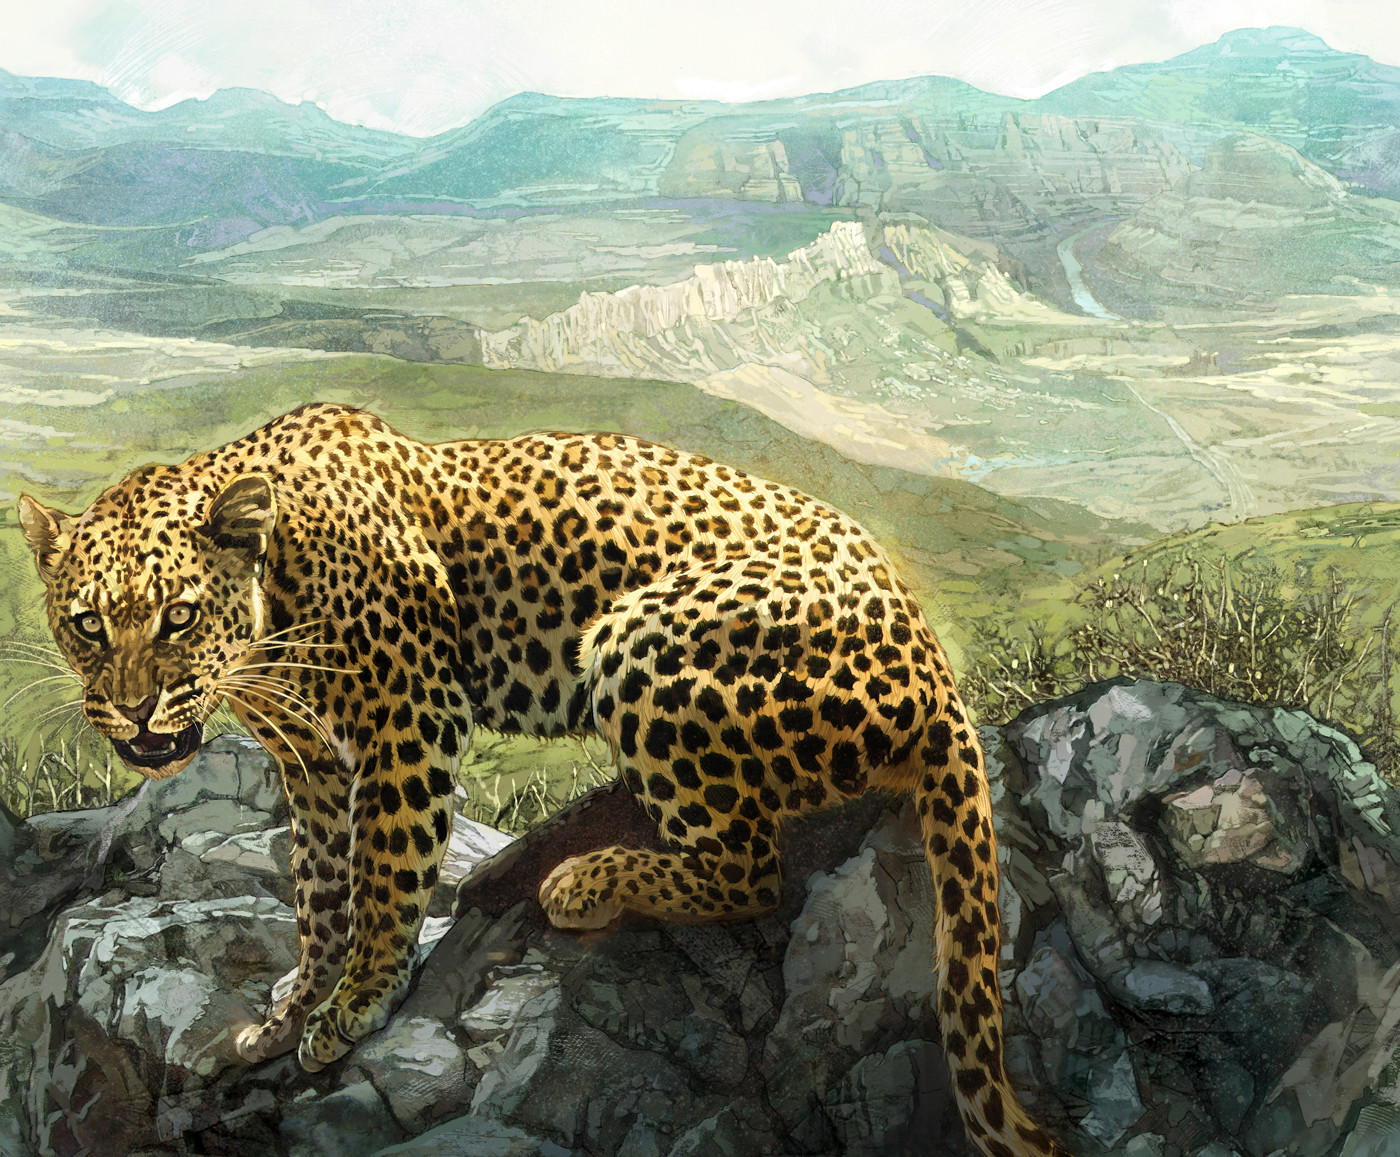 Kinsun loh leopard02